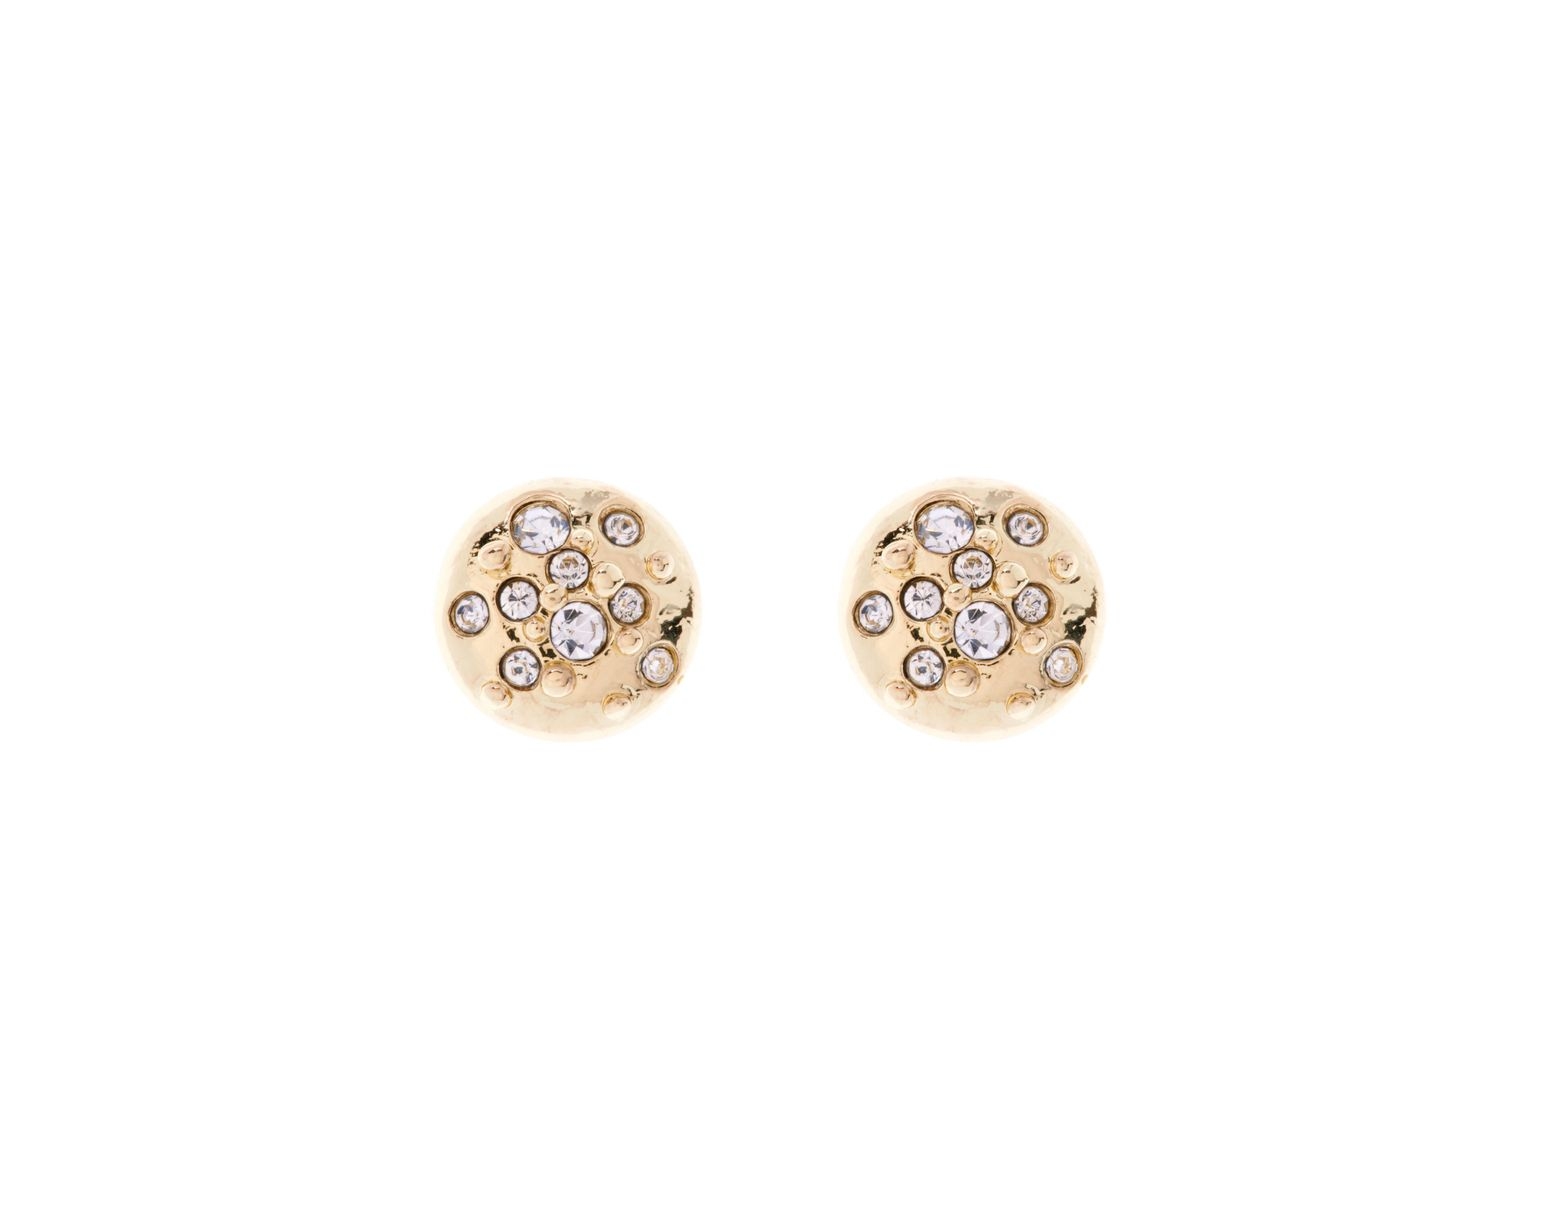 f87ba6c1b Karen Millen Crystal Sprinkle Stud Earrings - Gold Colour in Metallic - Lyst